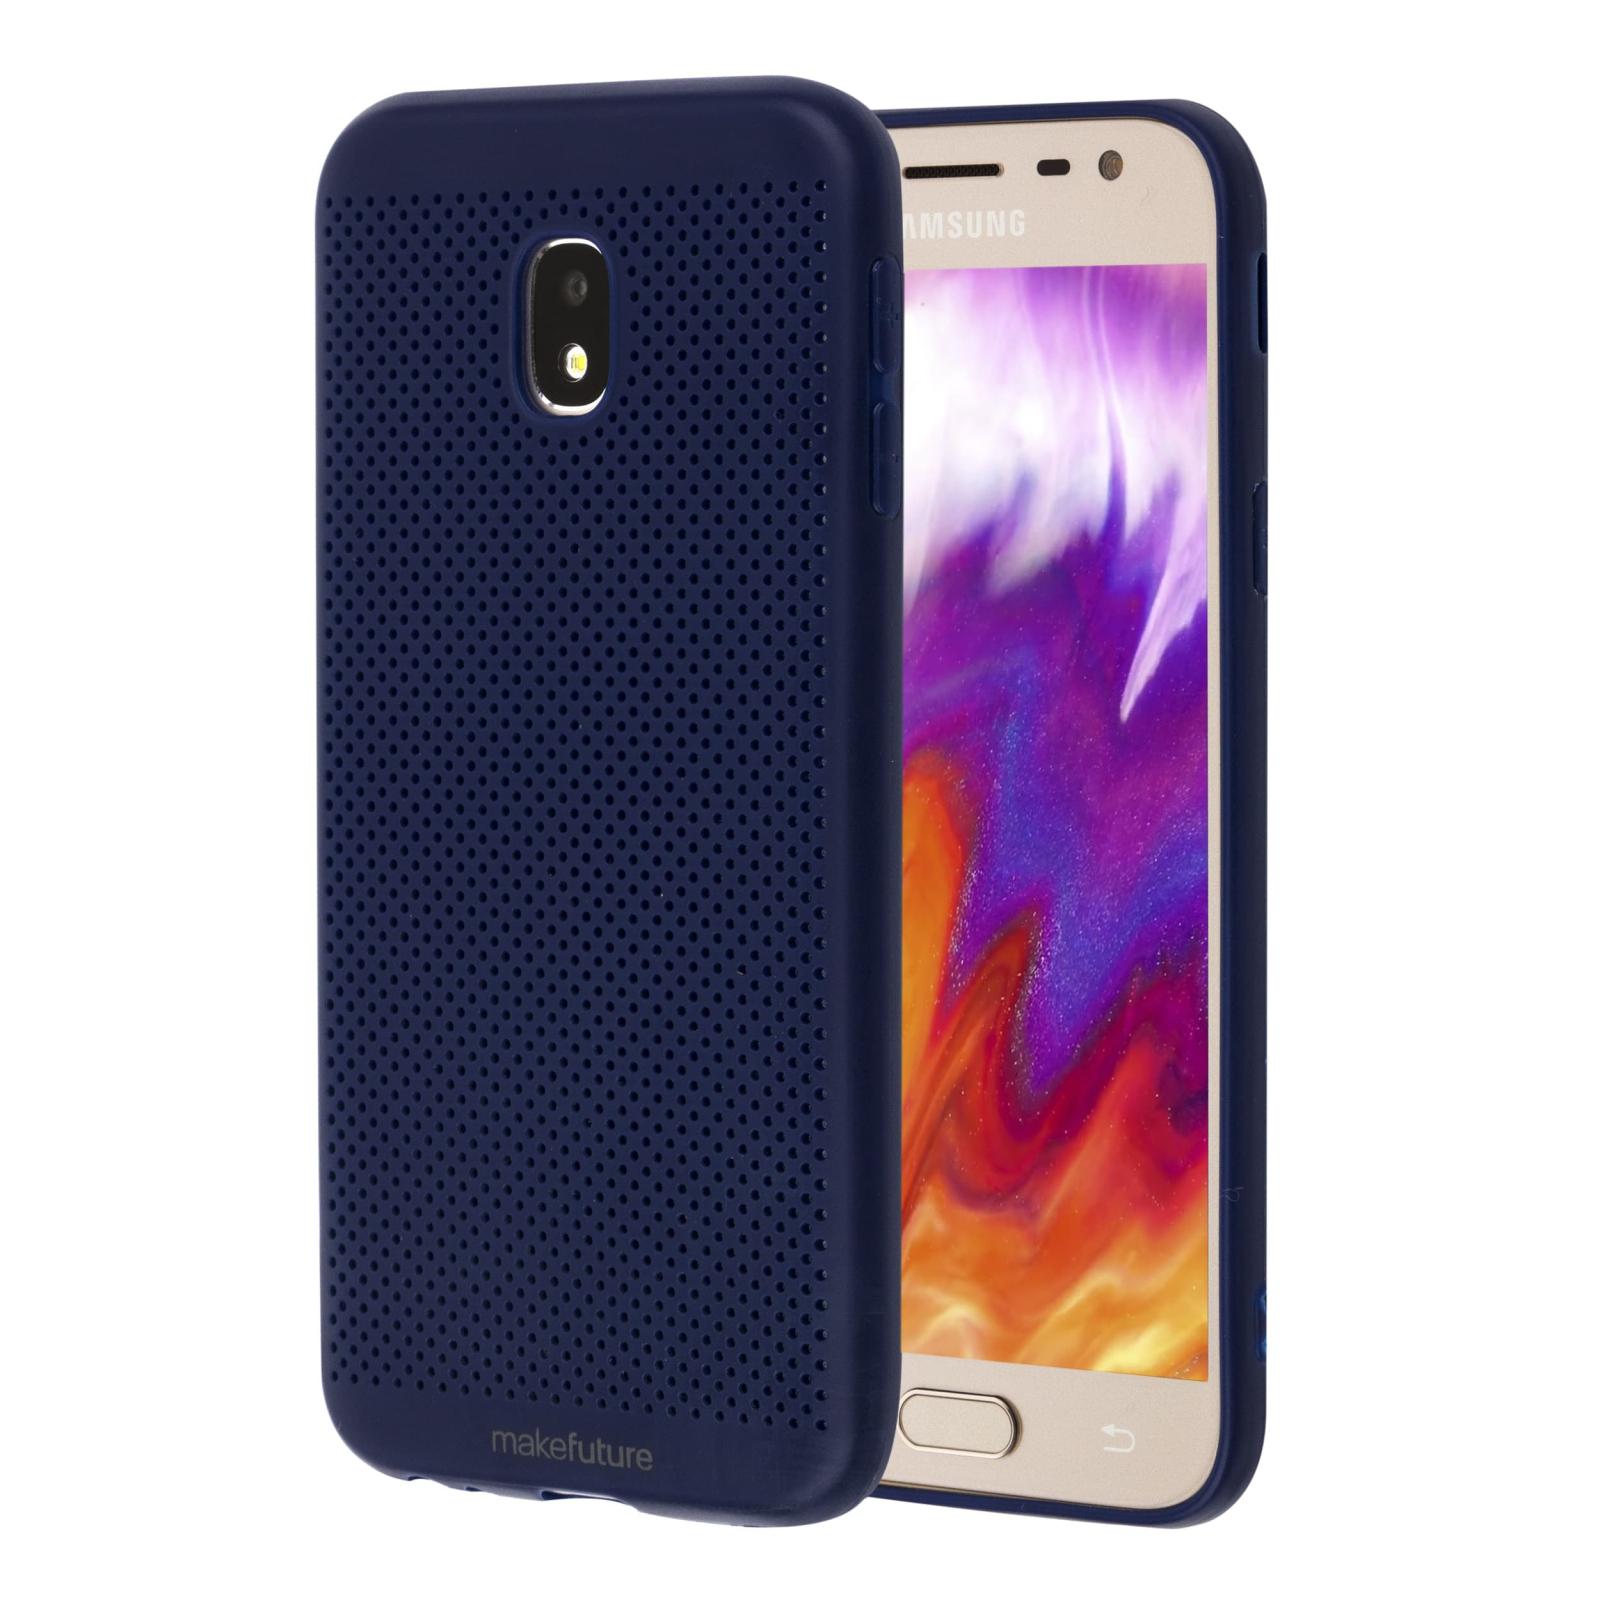 Чехол для моб. телефона MakeFuture Moon Case (TPU) для Samsung J3 2017 (J330) Blue (MCM-SJ330BL) изображение 2